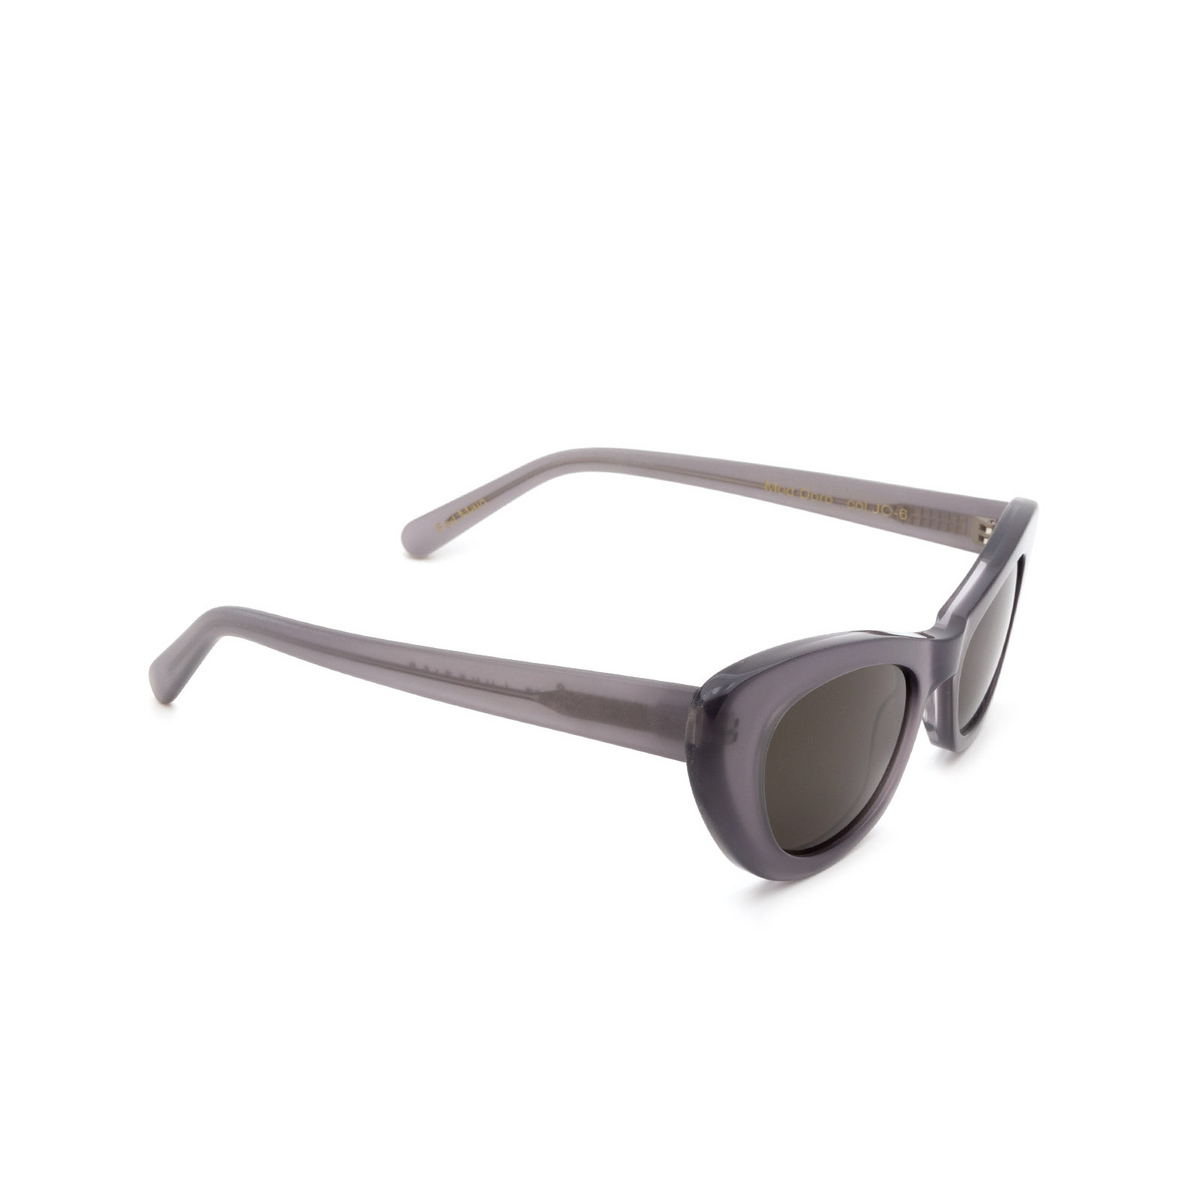 Lesca® Cat-eye Sunglasses: Doro color Gris JO-6 - three-quarters view.